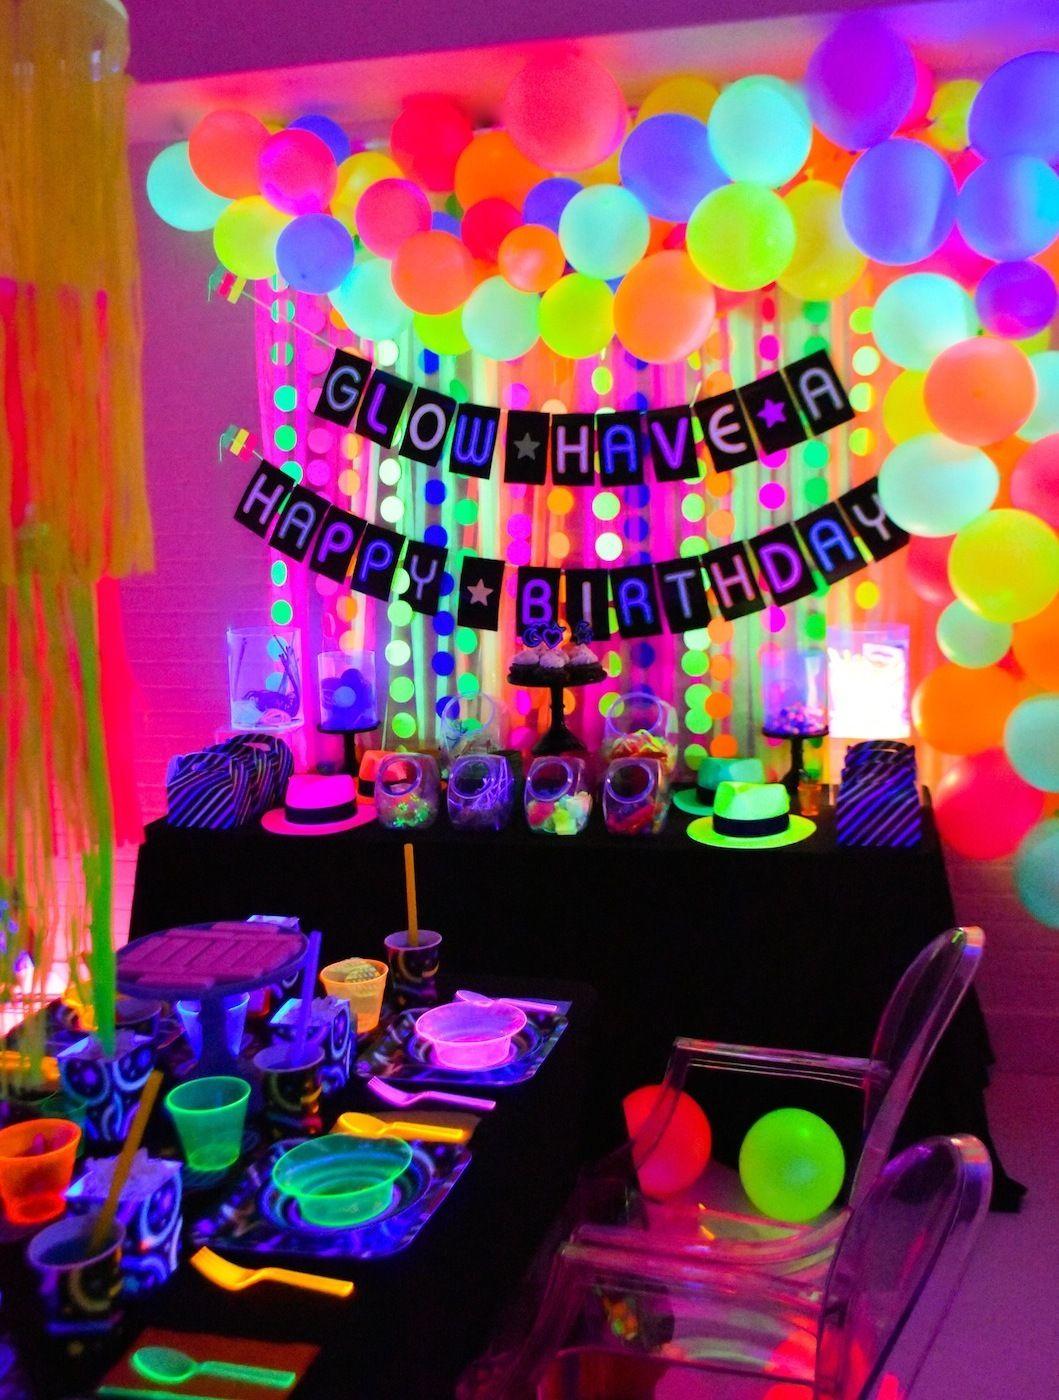 Fun365 Craft Party Wedding Classroom Ideas Inspiration Glow Stick Party Glow Birthday Neon Party